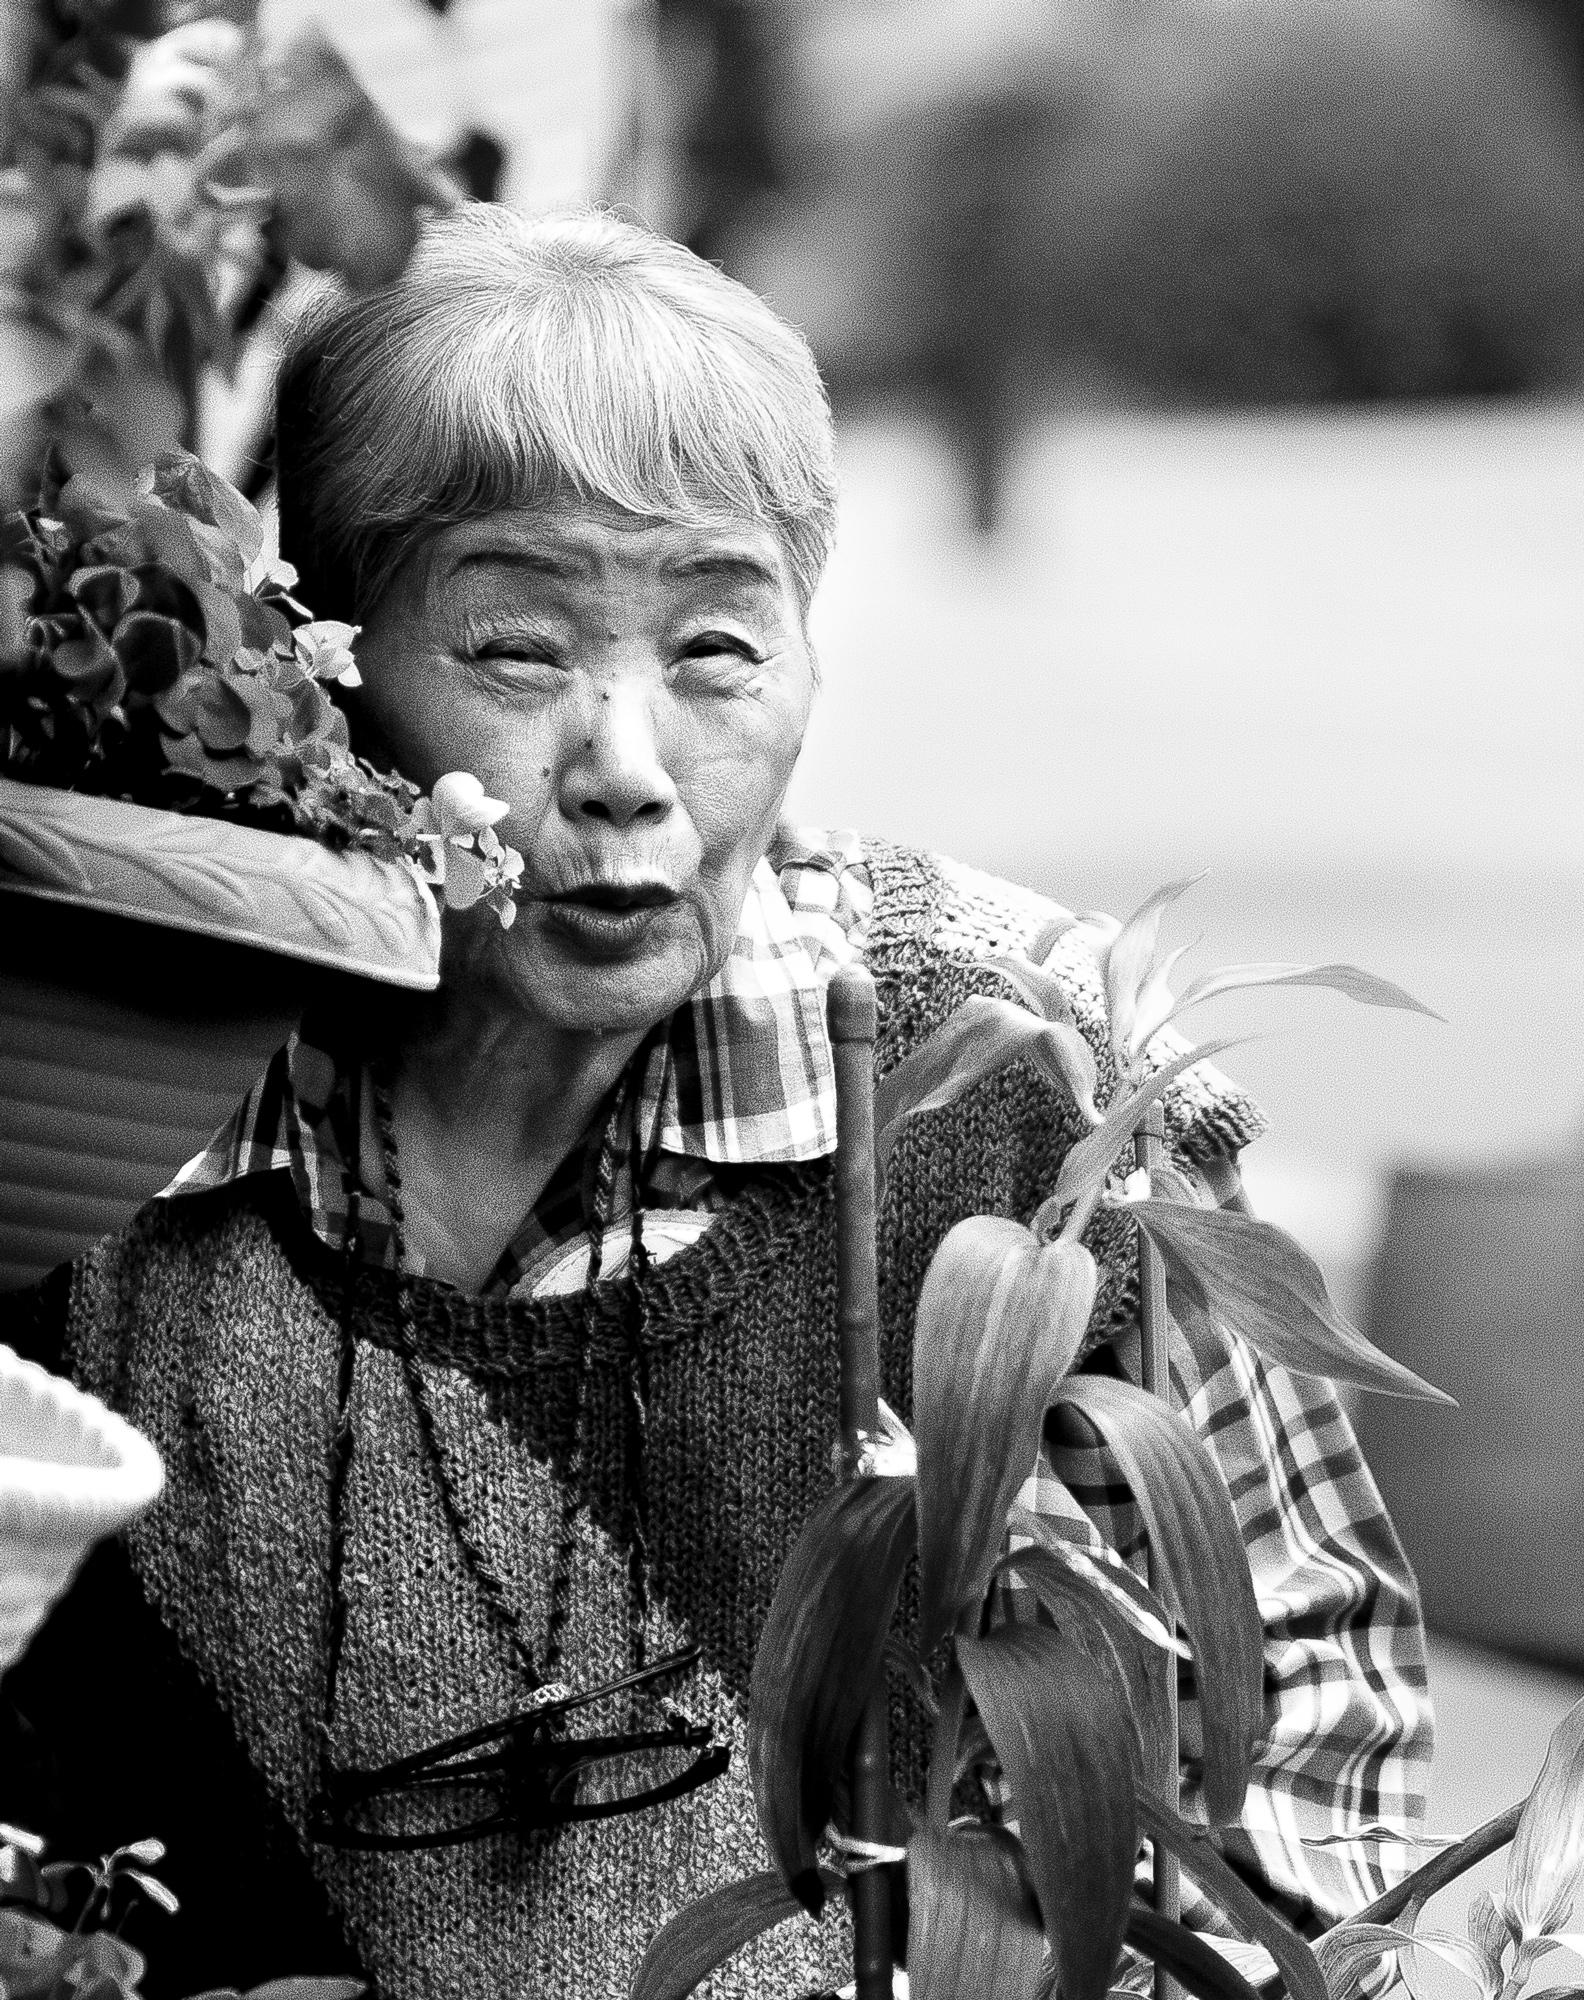 Osaka street photography Japan